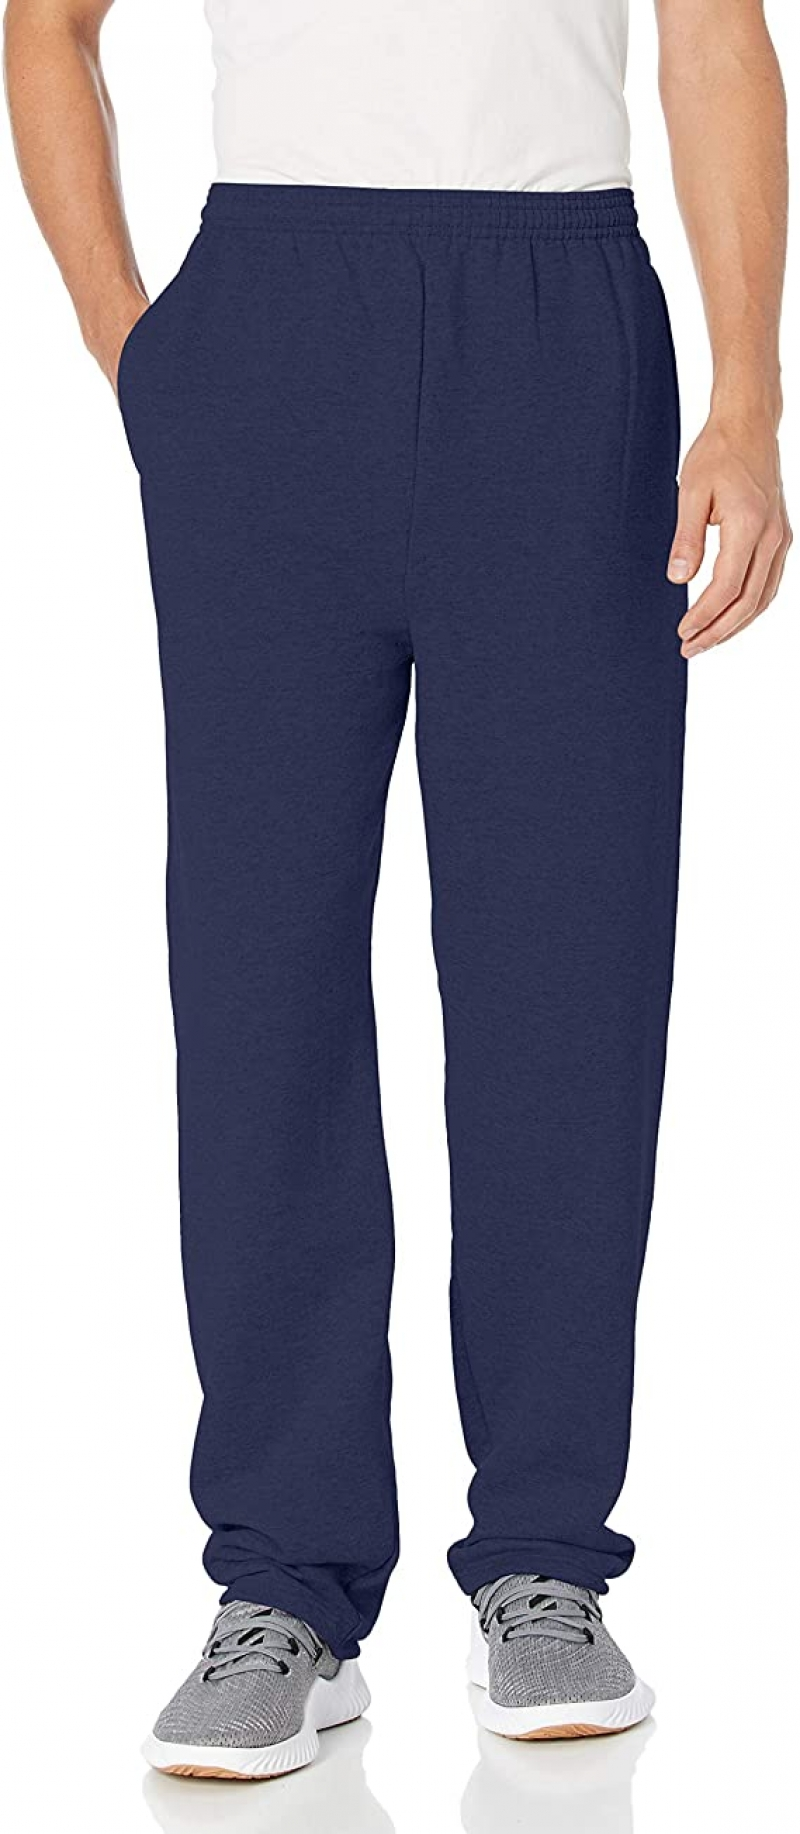 ihocon: Hanes Men's EcoSmart Open Leg Fleece Pant with Pockets 男士長褲